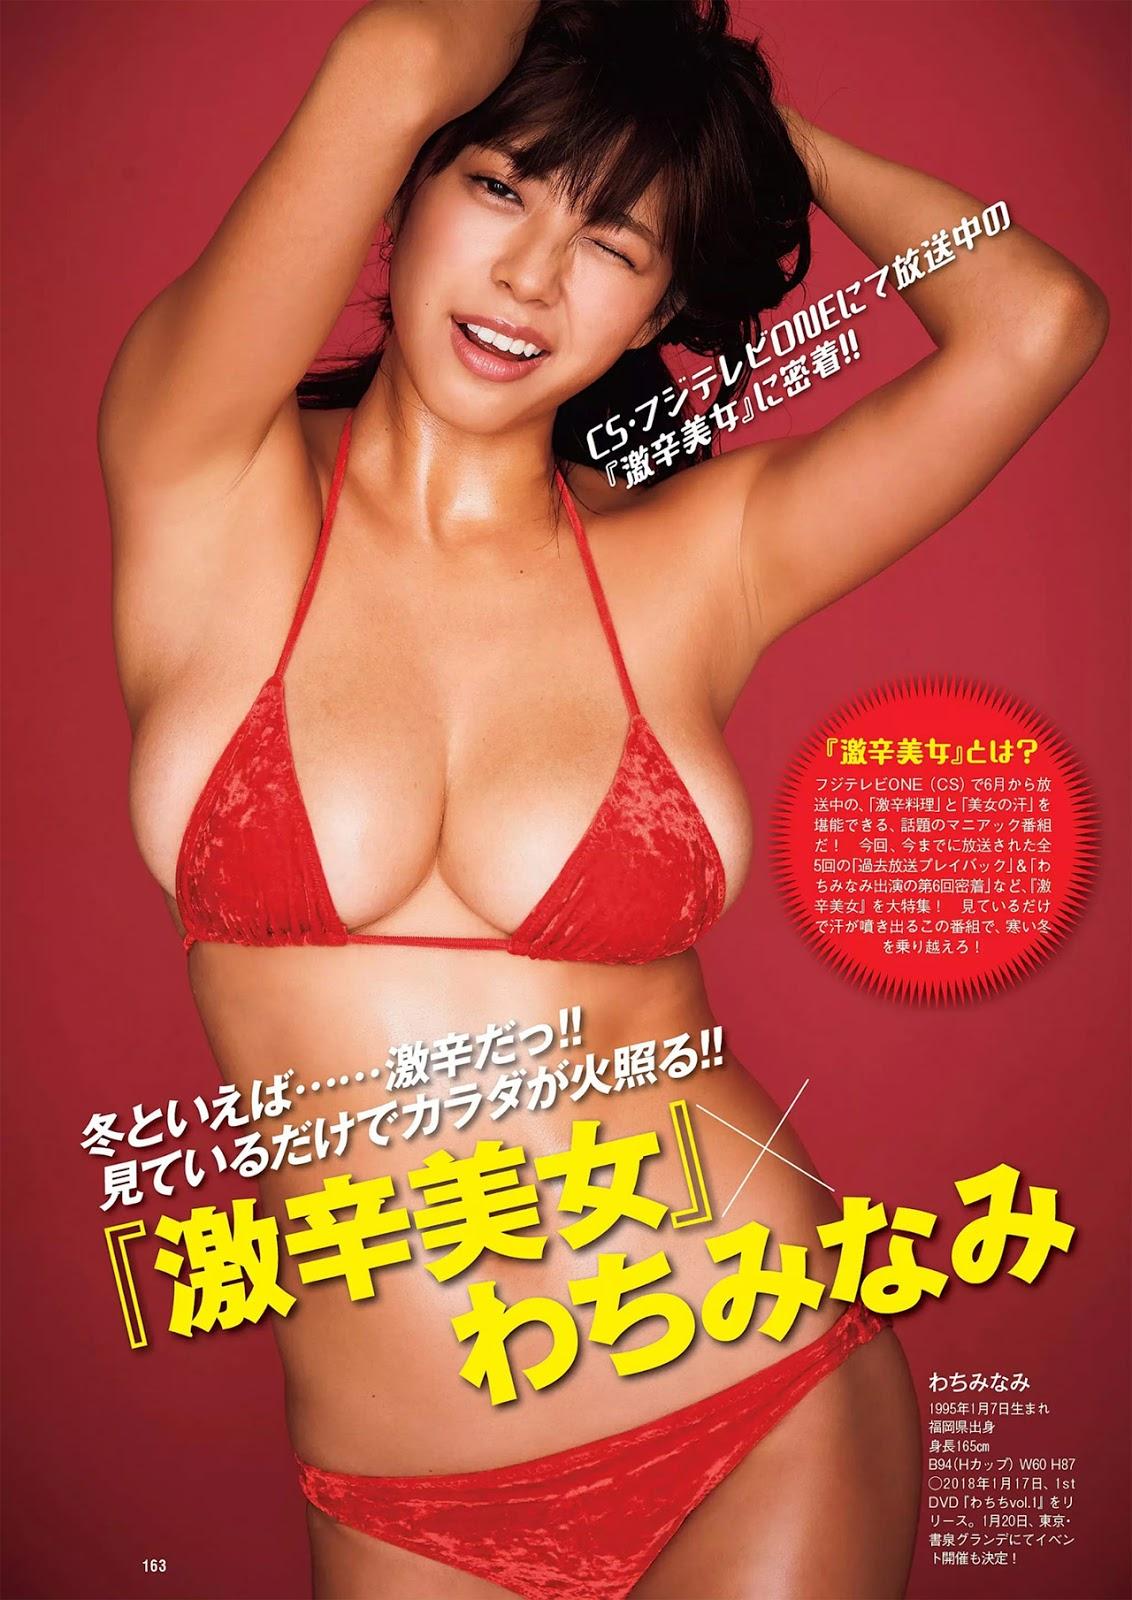 Minami Wachi わちみなみ, Weekly Playboy 2017 No.52 (週刊プレイボーイ 2017年52号)